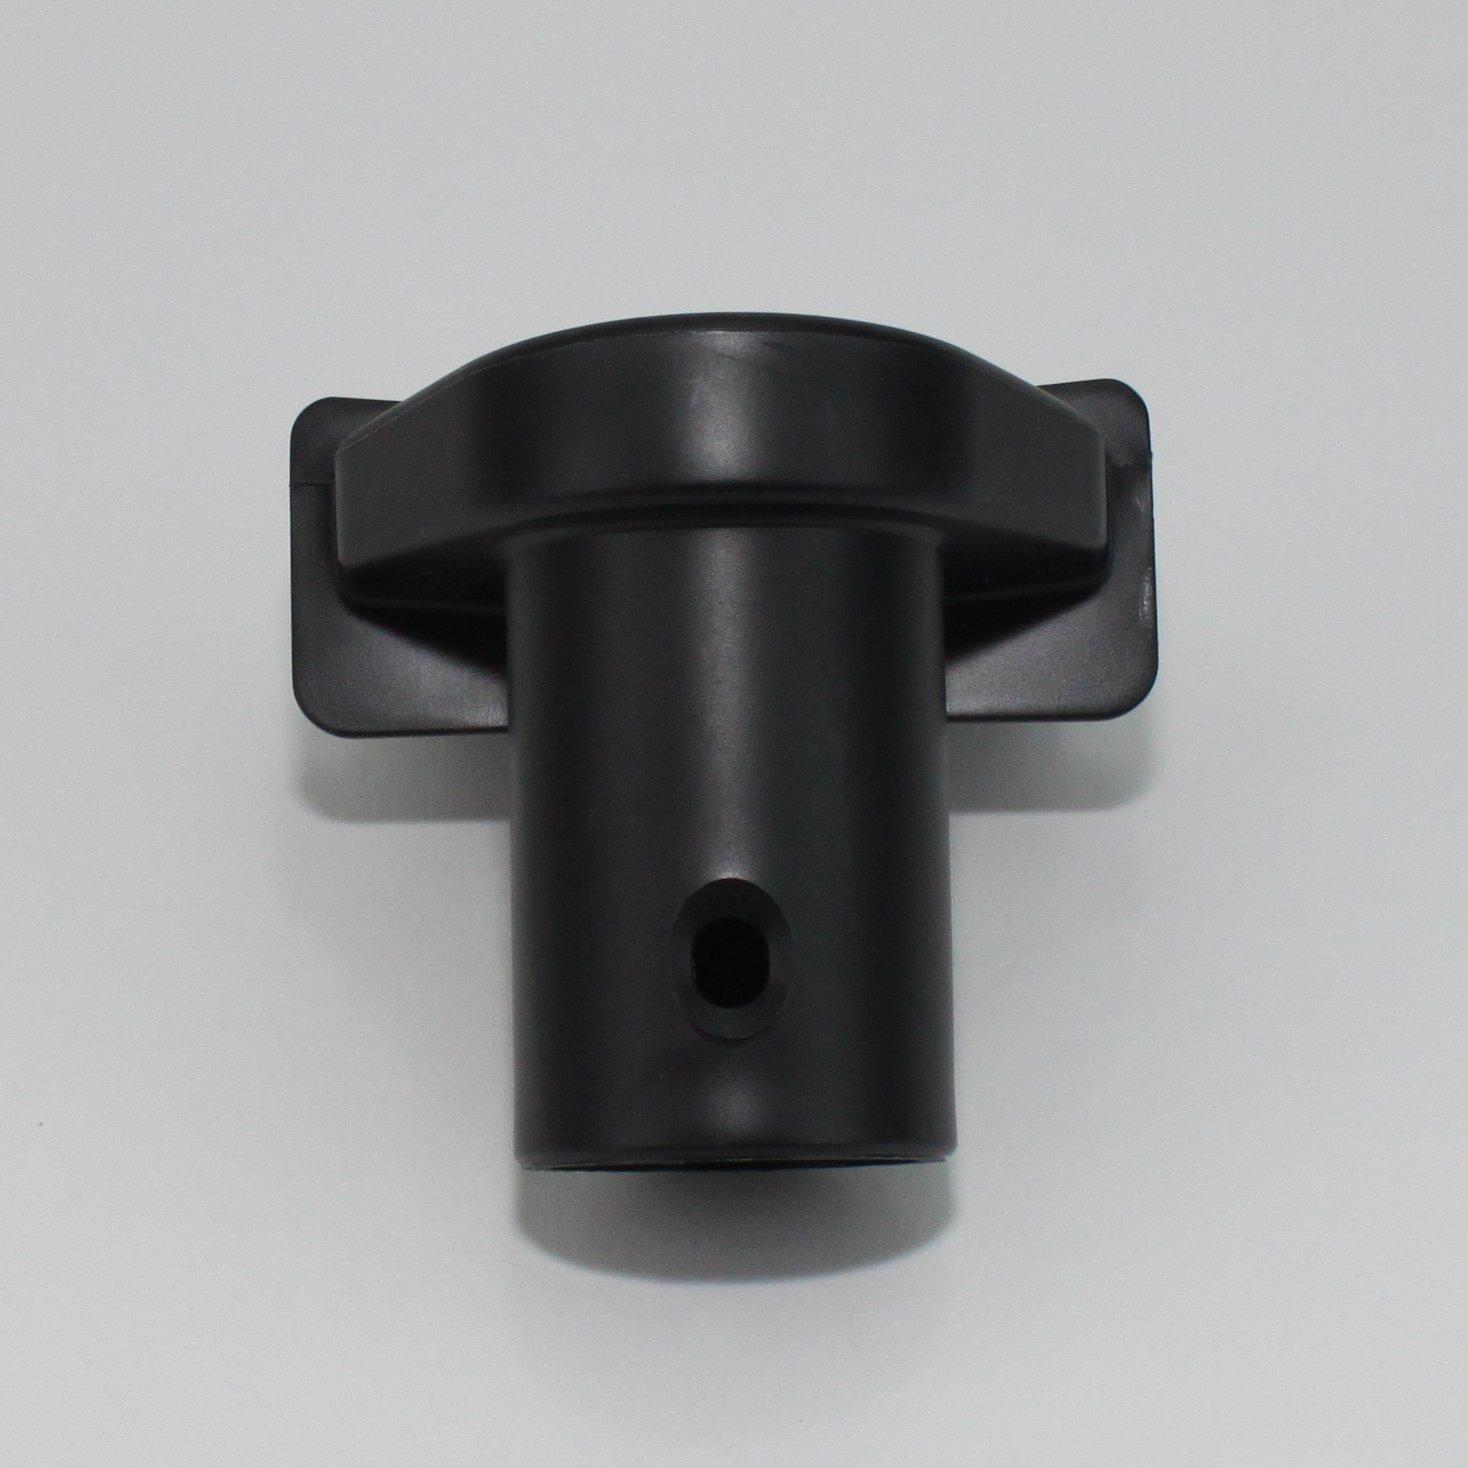 Genuine Vax V-026 Dirty Water Tank Adaptor 1-3-127528-00